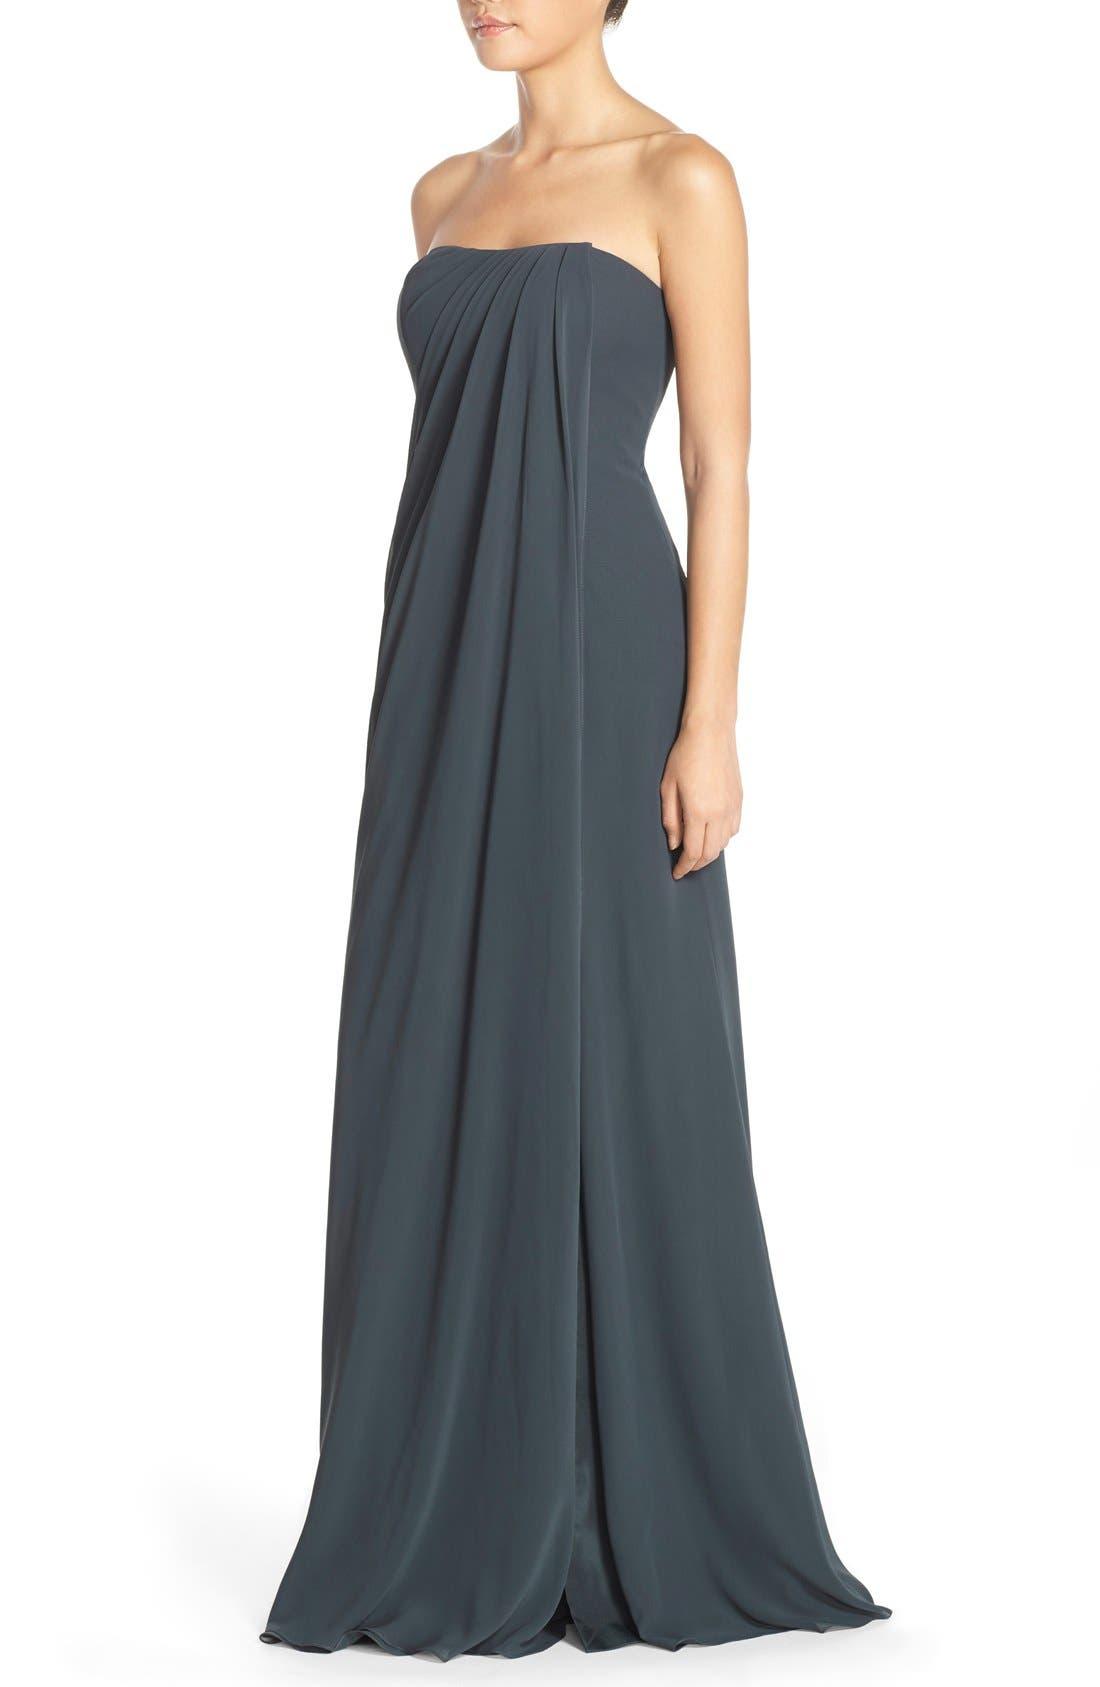 Raquel Front Slit Strapless Chiffon Gown,                             Alternate thumbnail 2, color,                             026